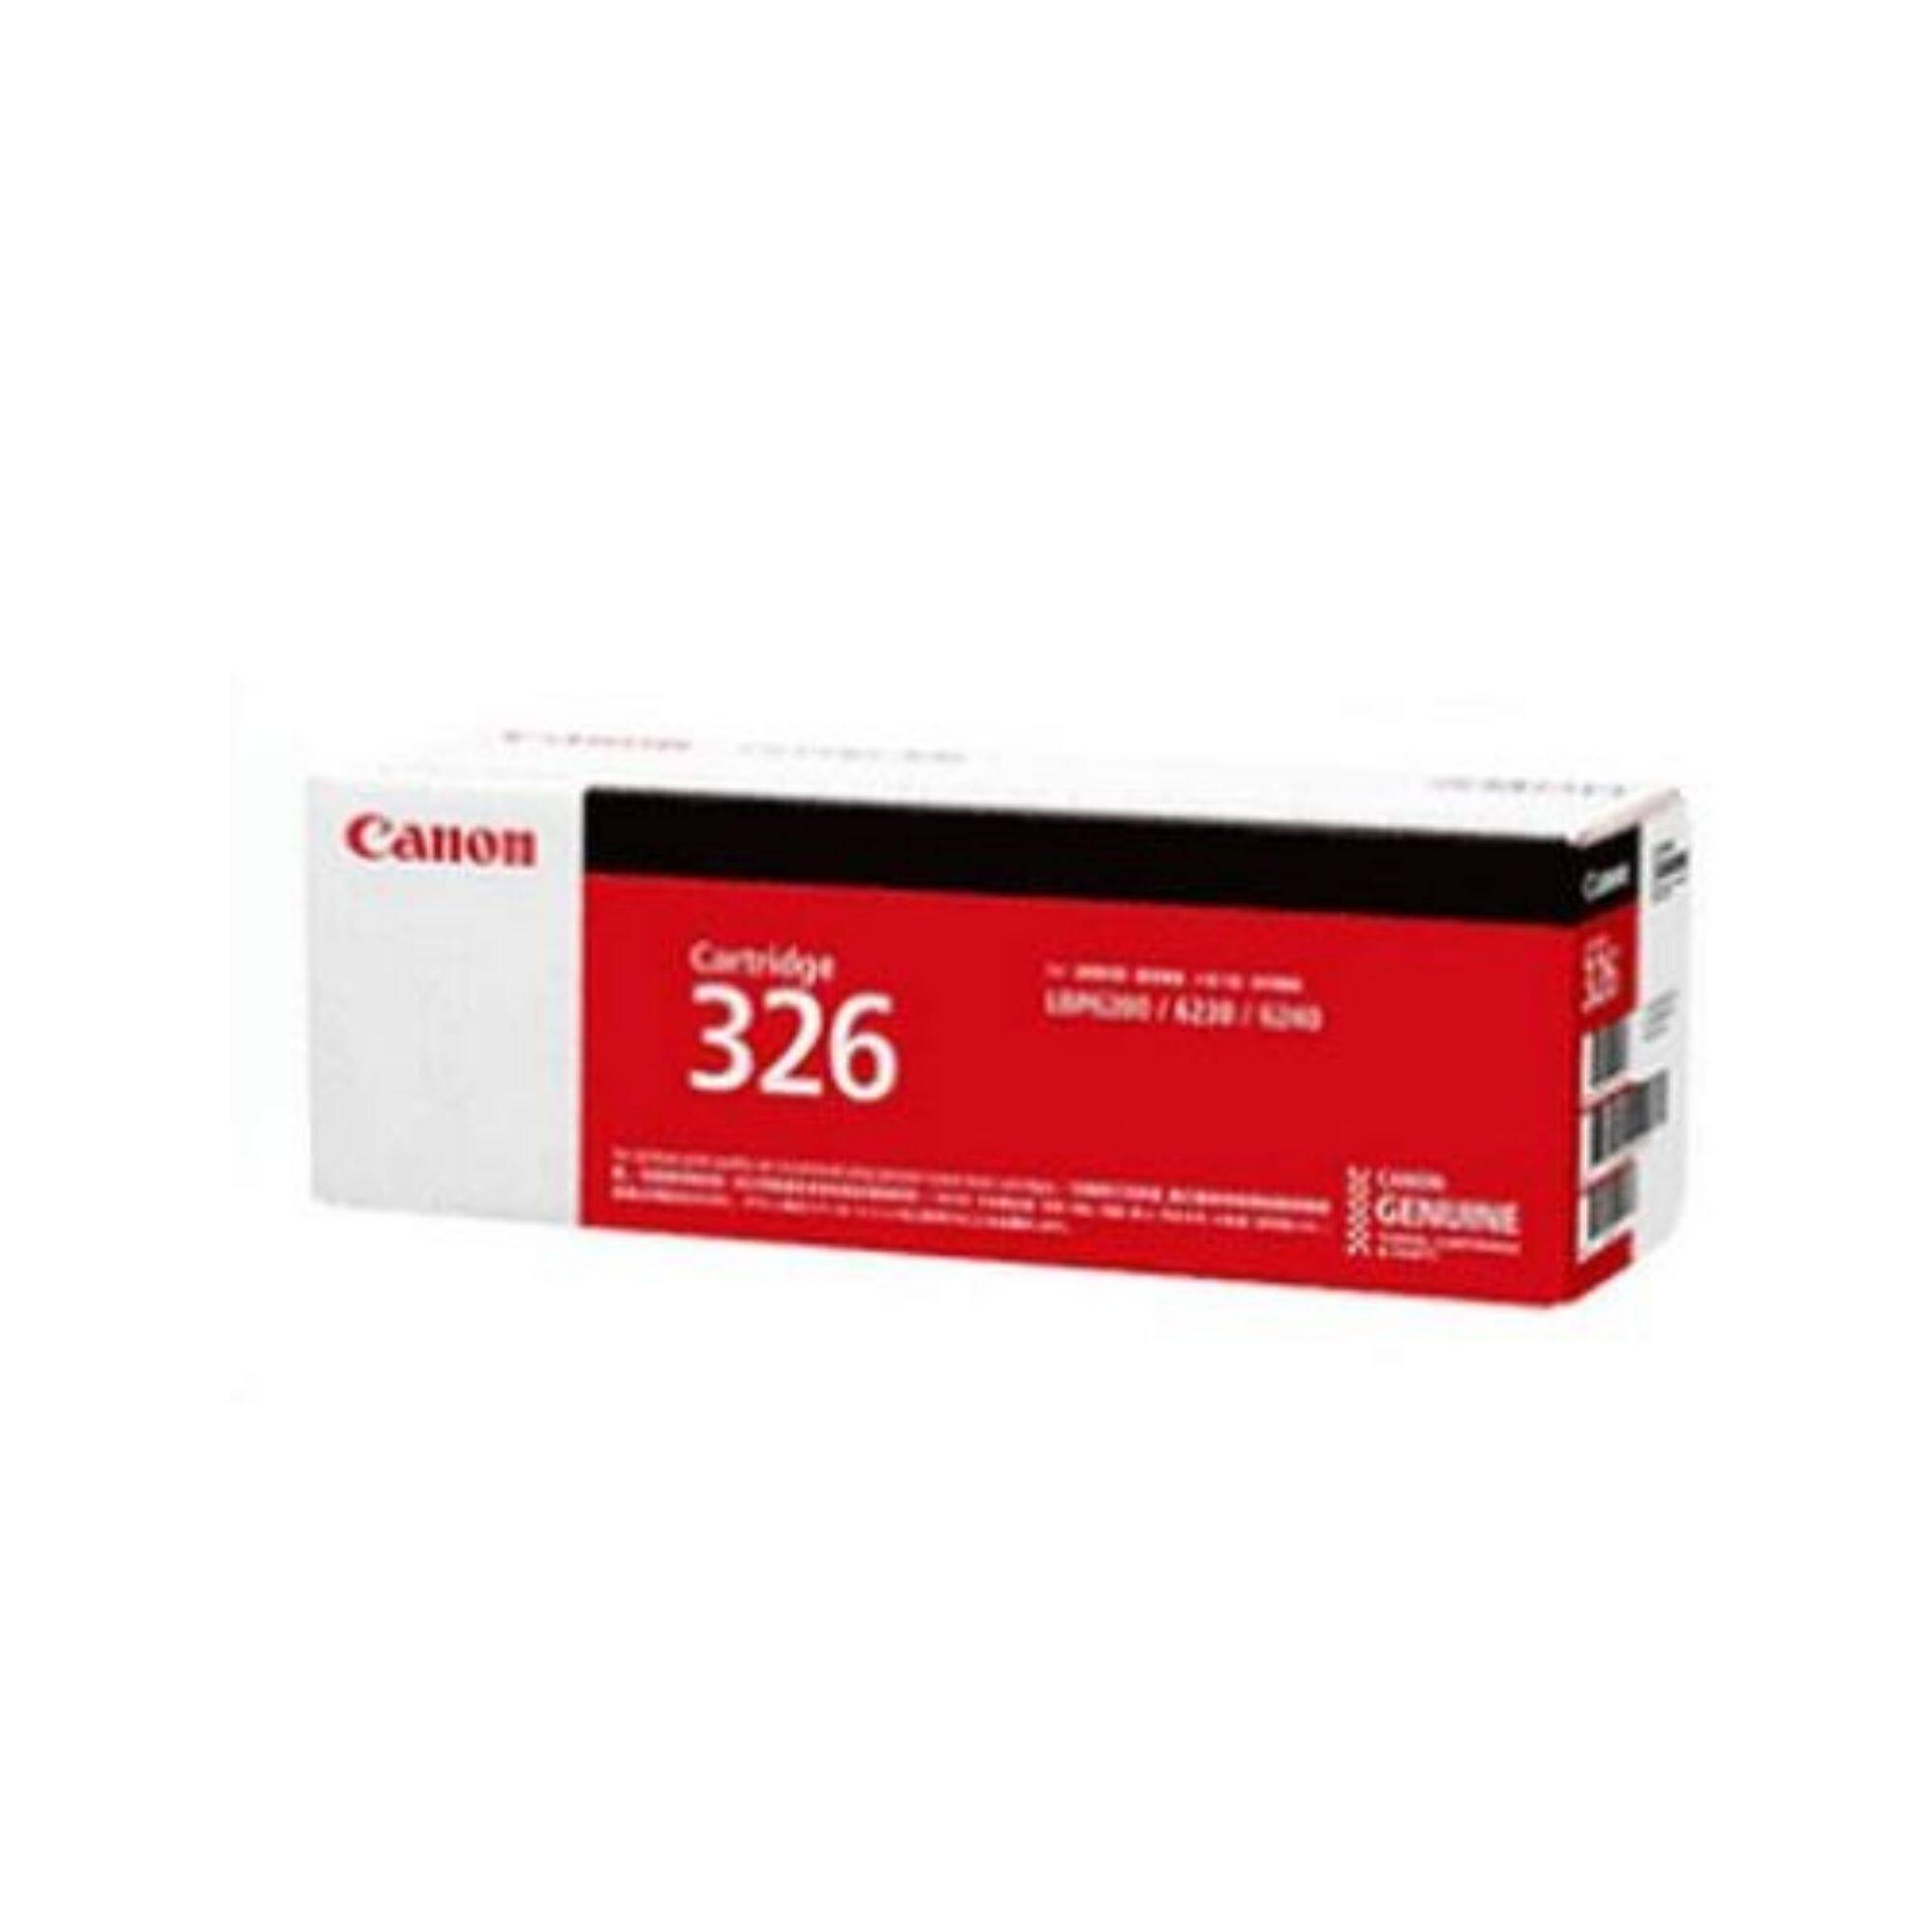 Canon Cart 326 Toner for LBP-6200d/ LBP-6230dn Printer